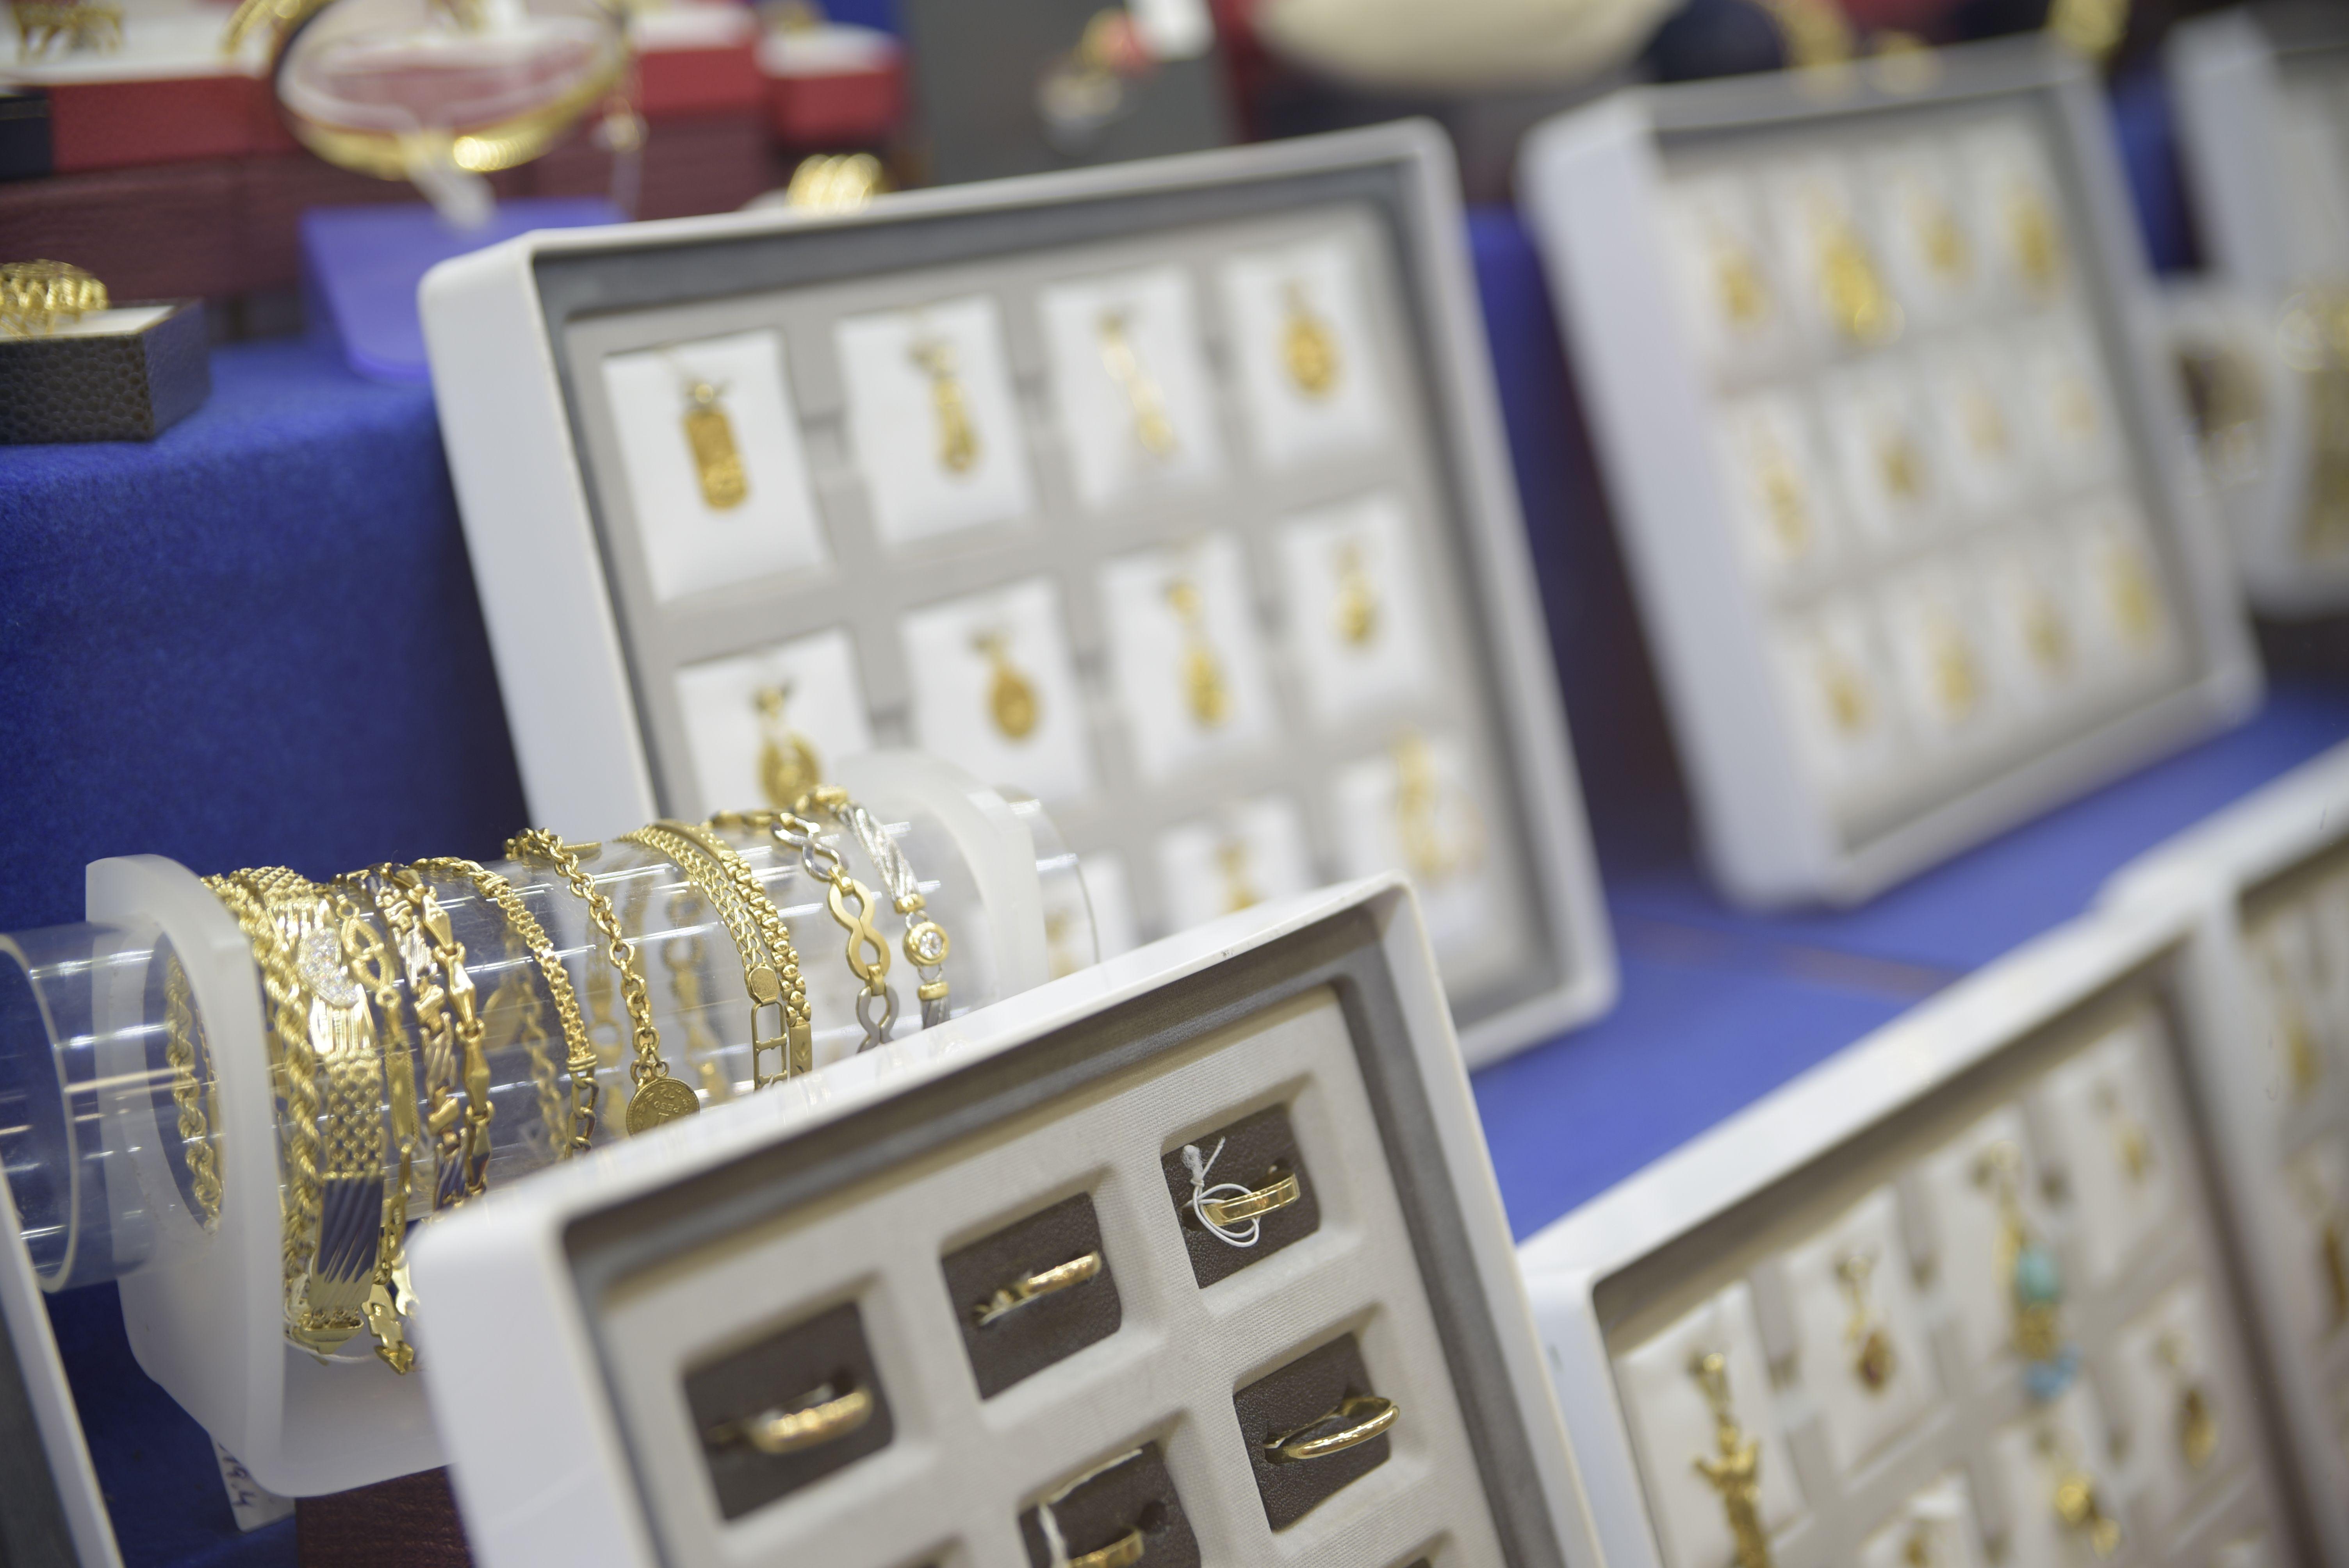 Expositor de joyas de oro